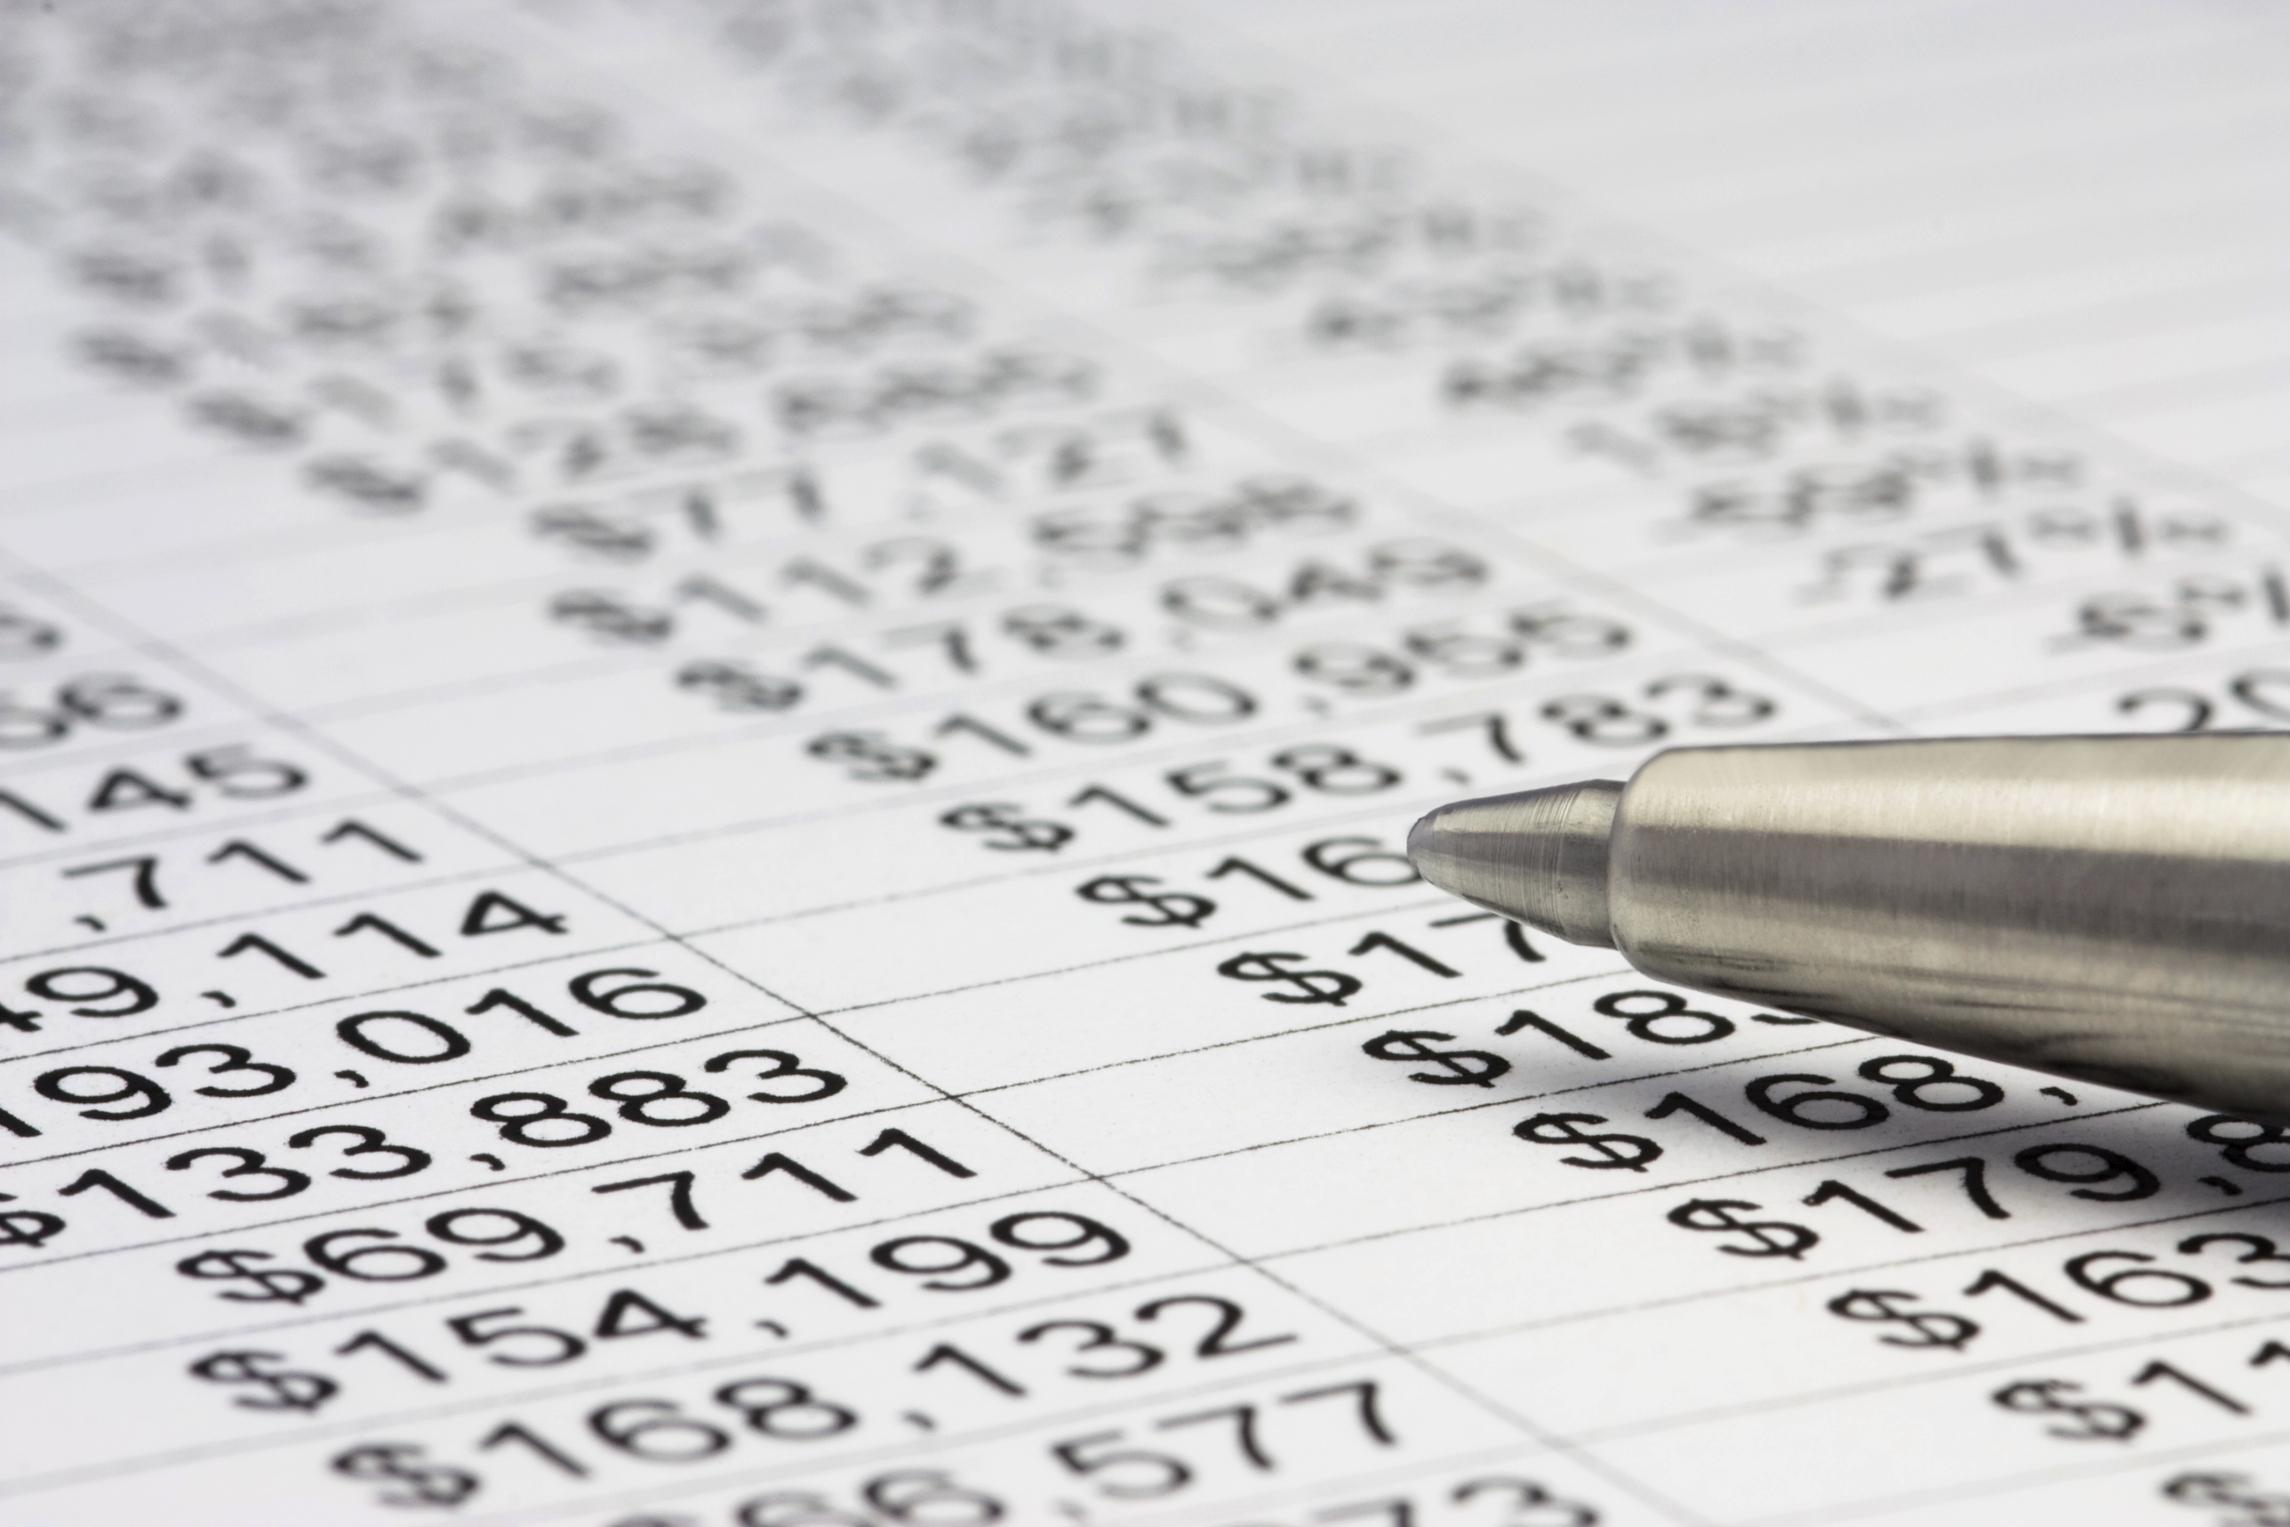 belief essay topics in marathi language